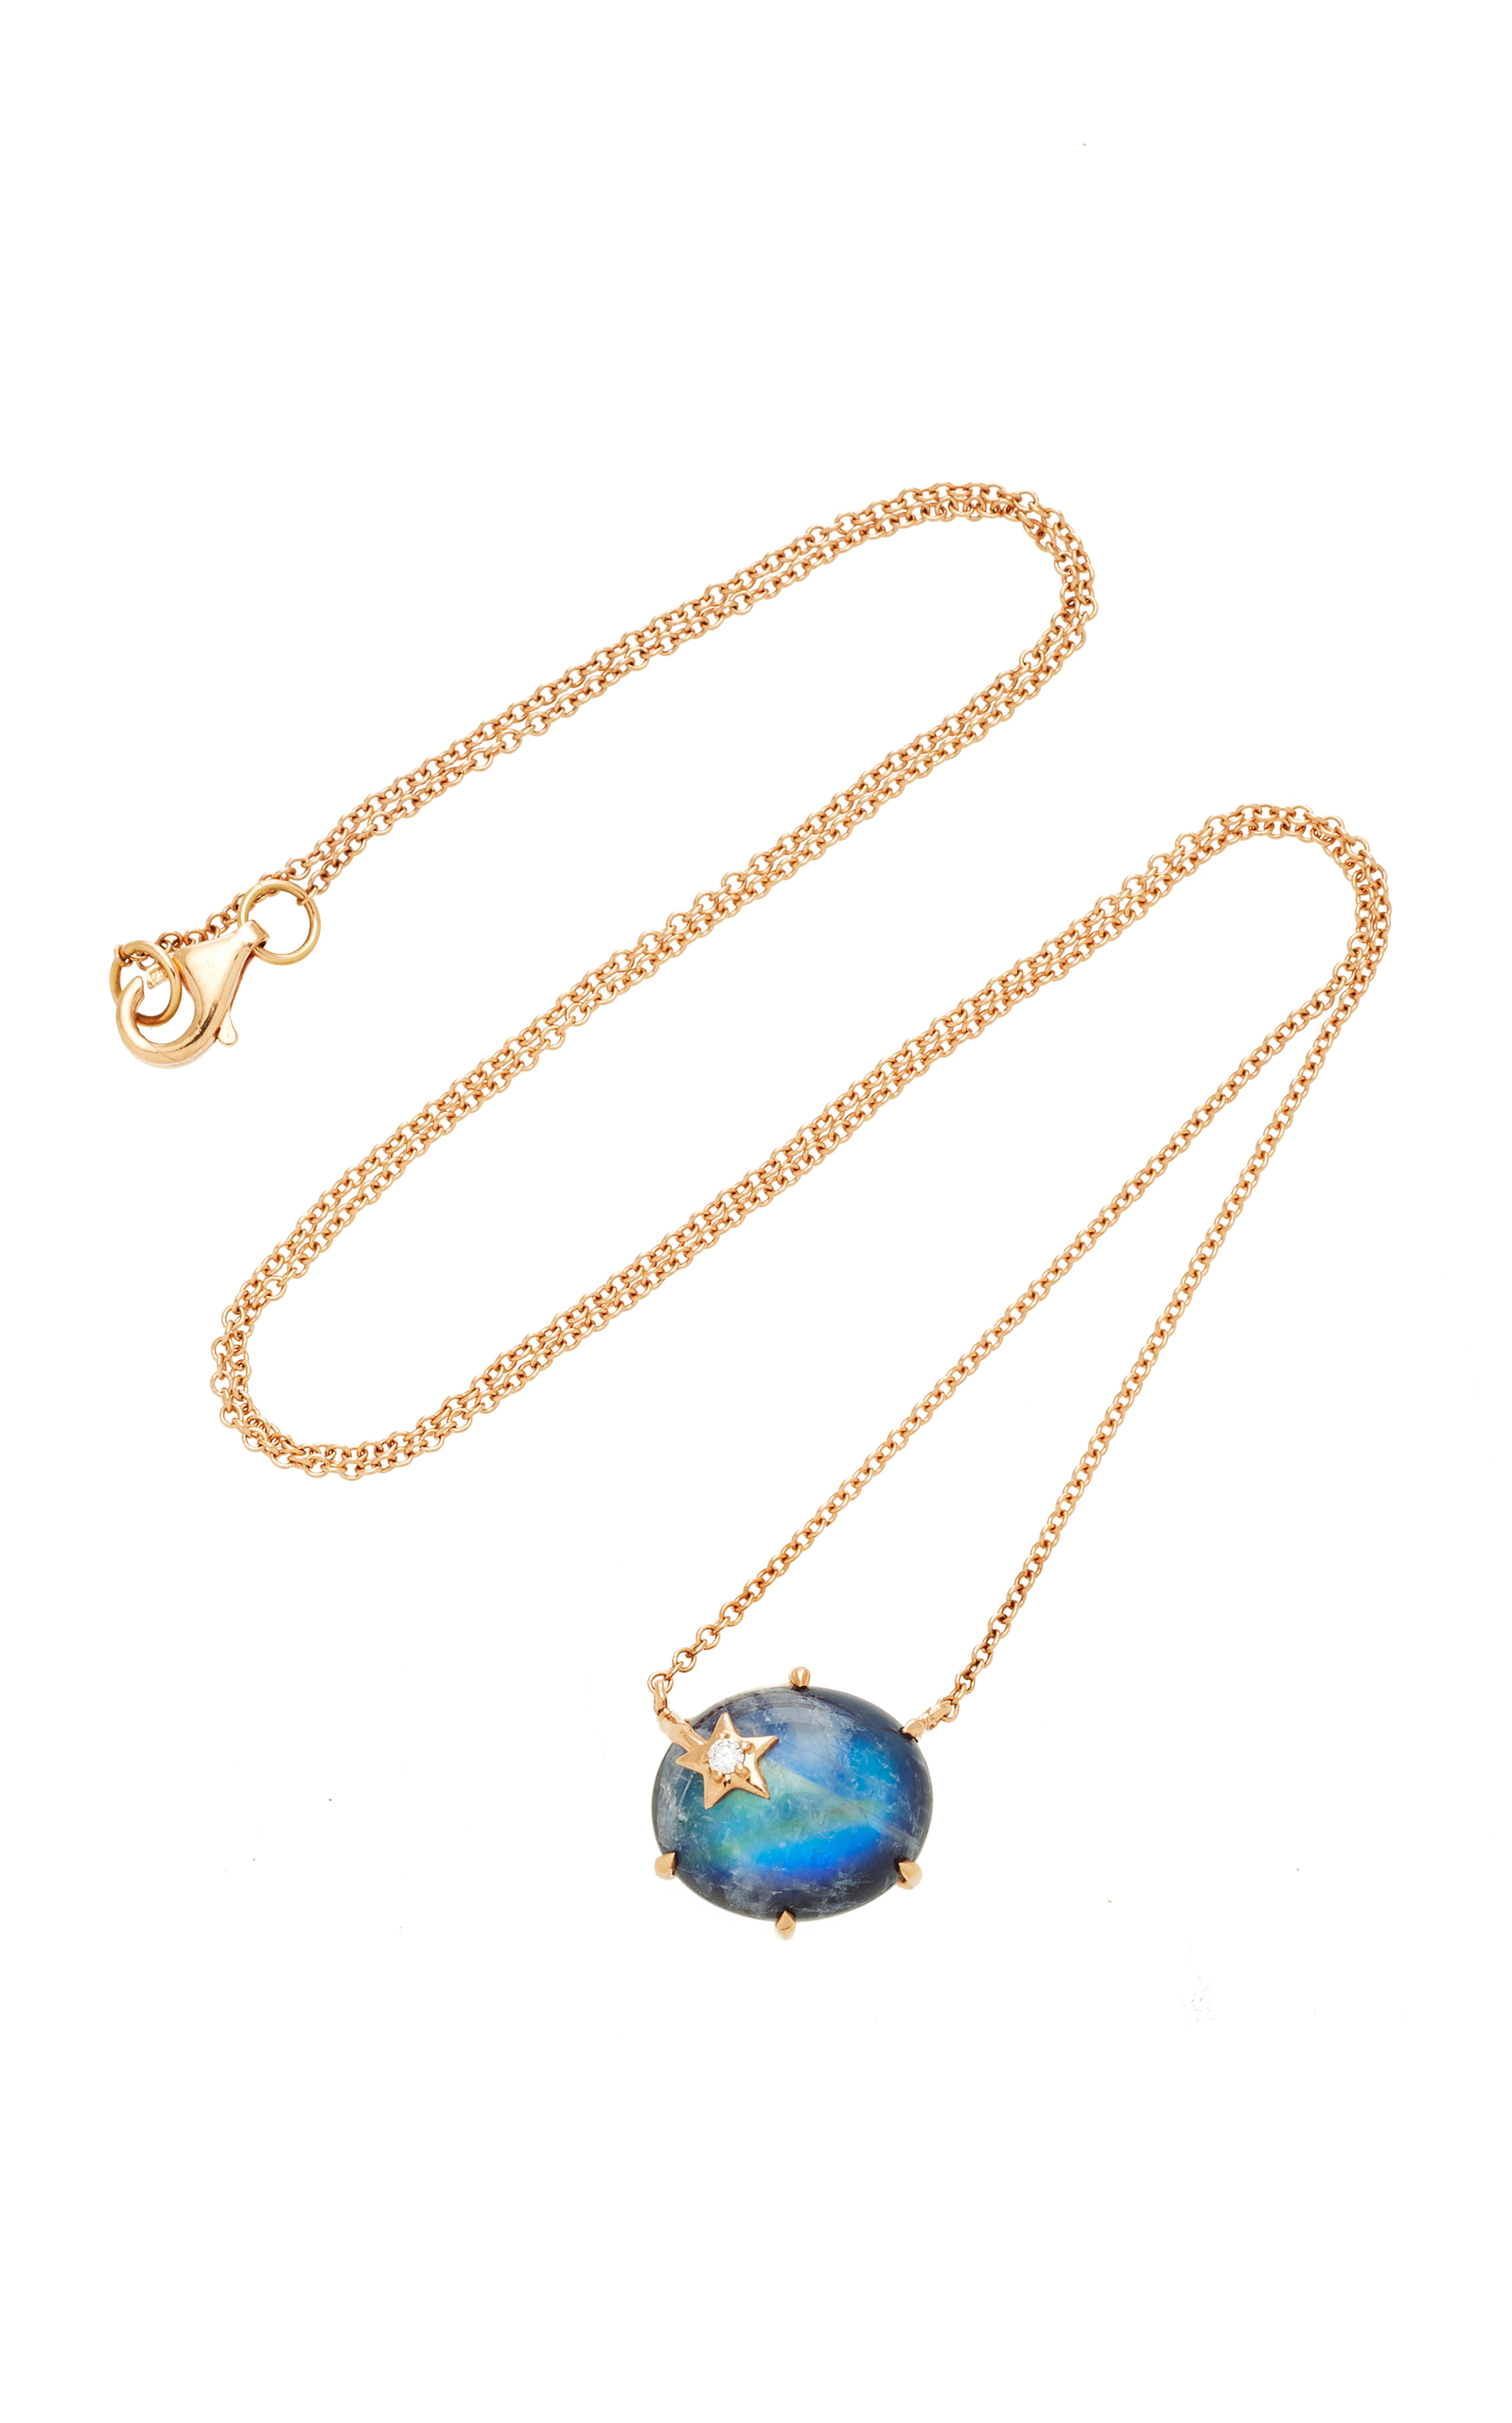 Andrea Fohrman Mini Galaxy 18-karat Rose Gold Multi-stone Necklace CDO2CxqyD